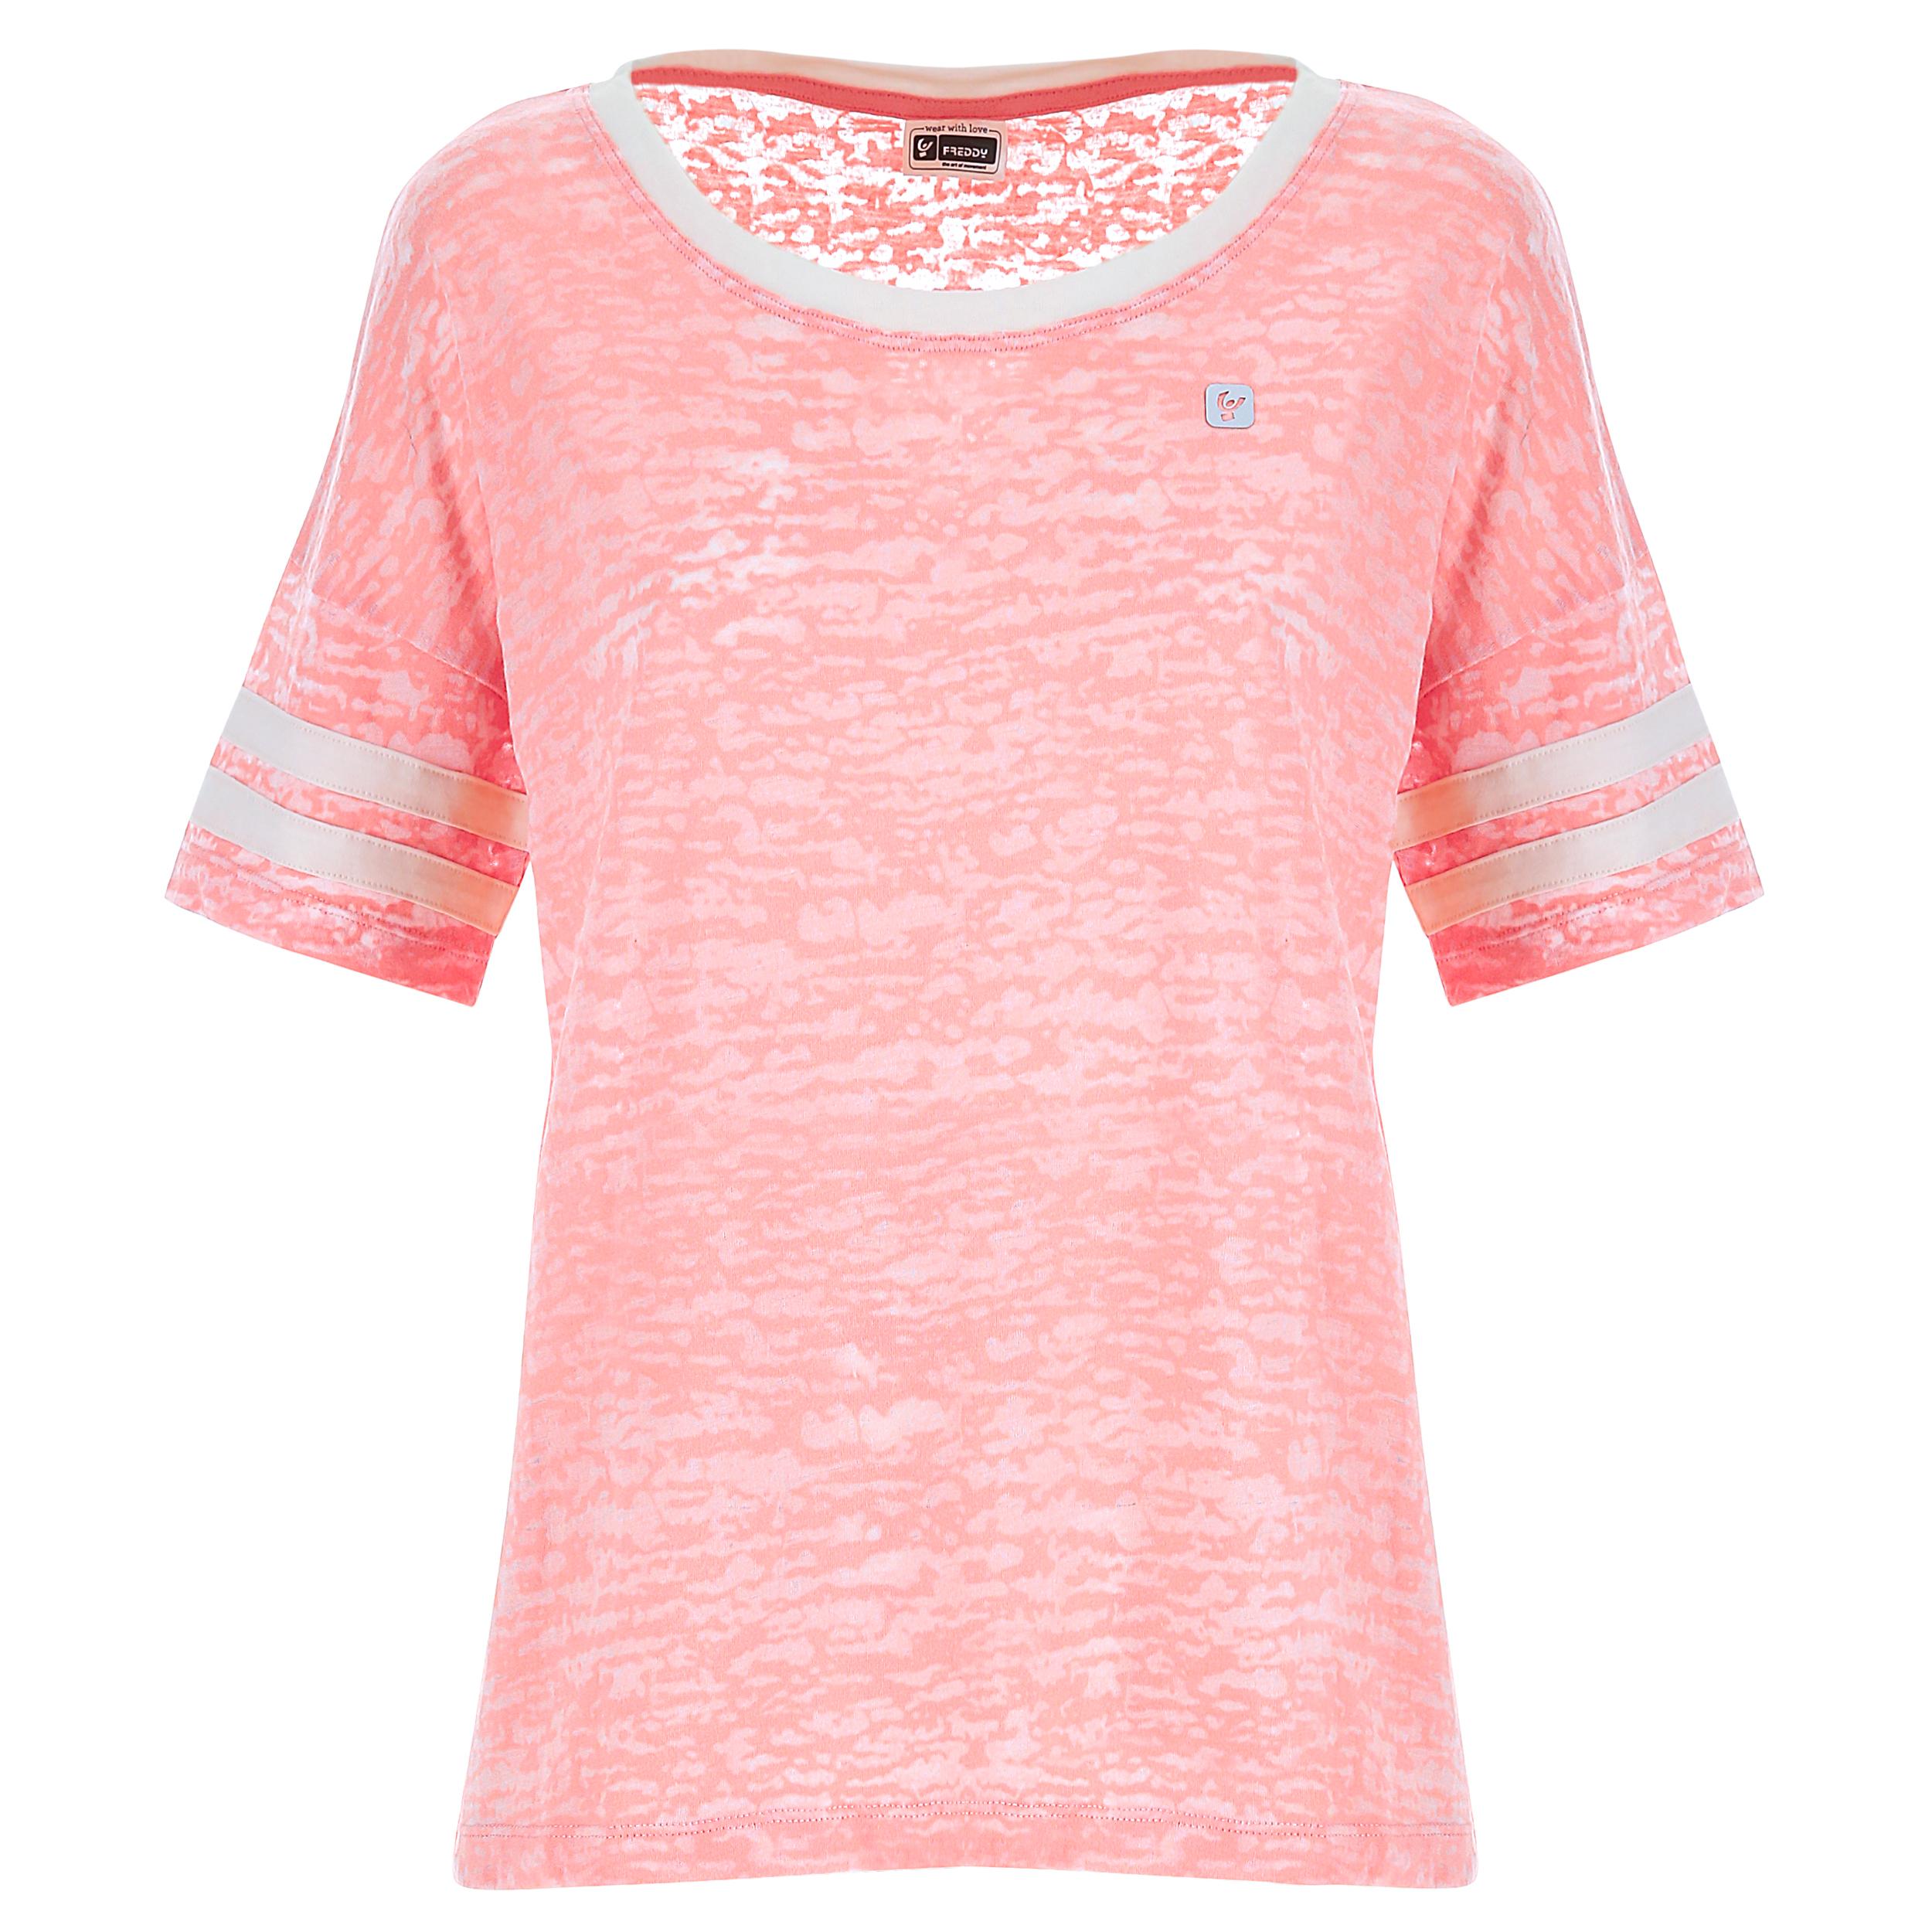 T-shirt da donna in cotone devoré con bande a contrasto